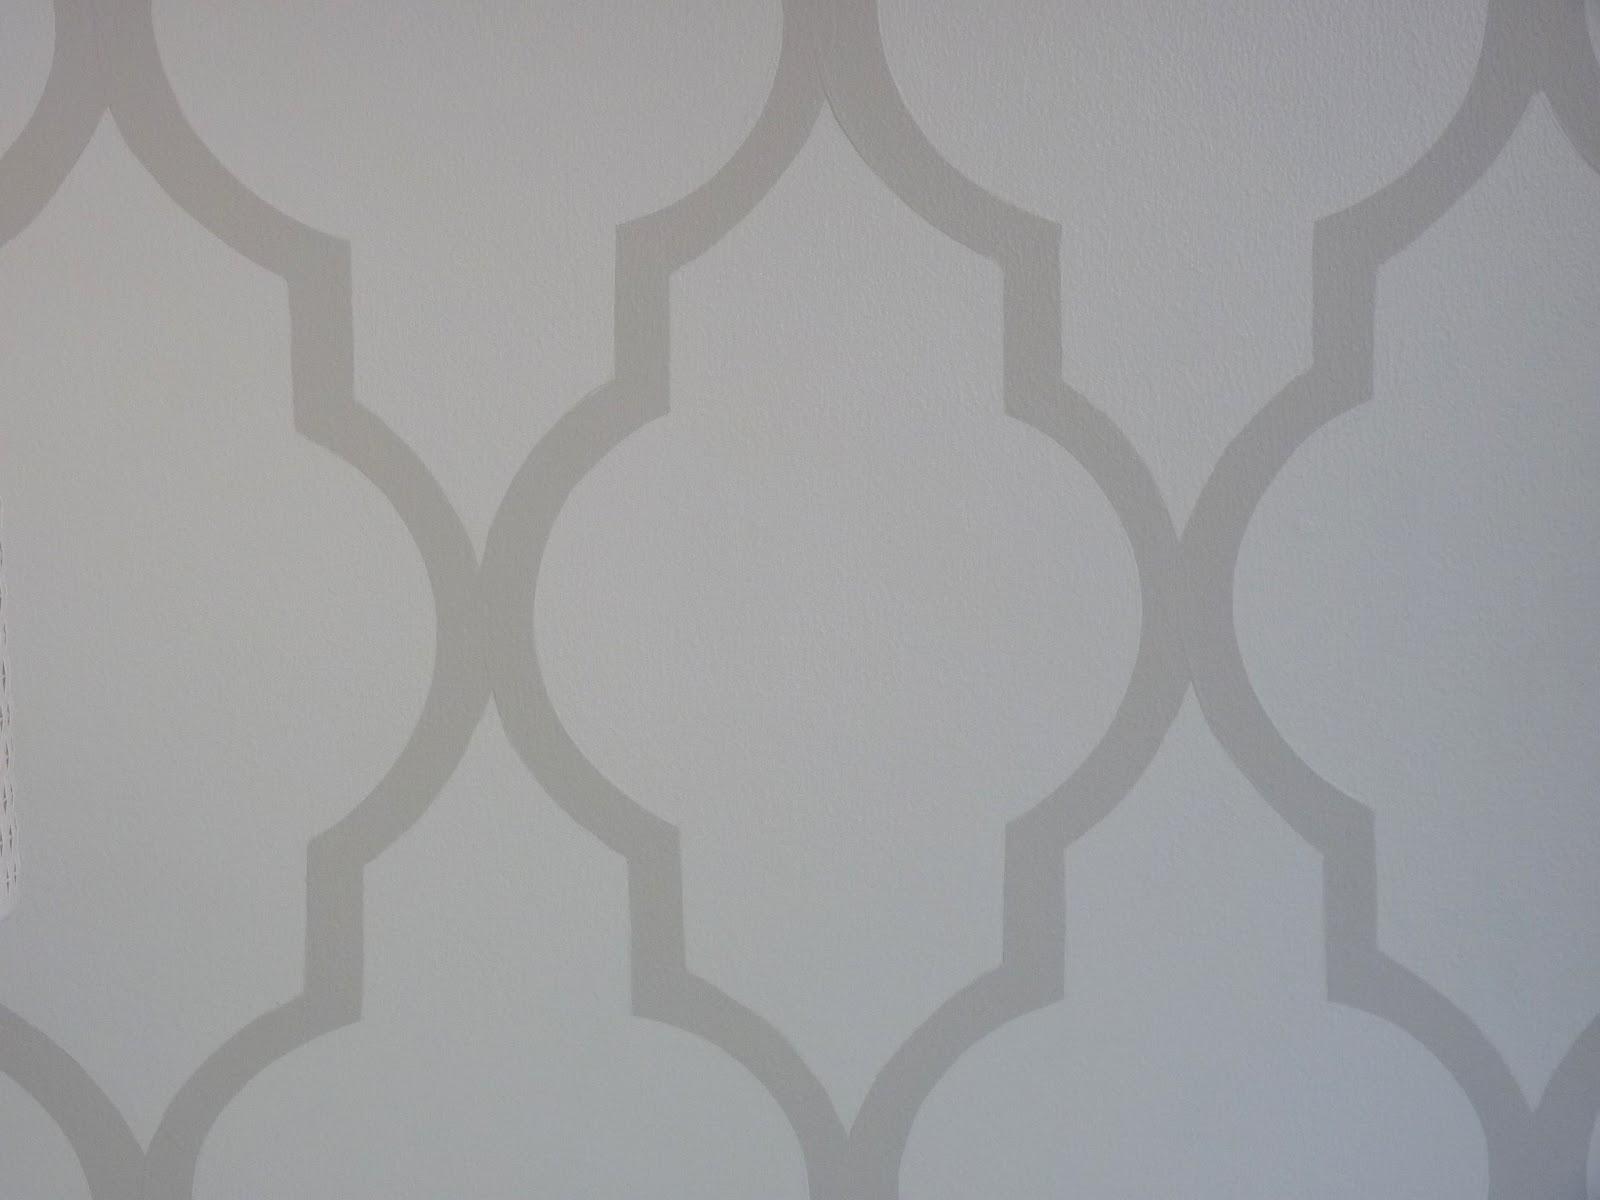 Free printable moroccan stencil joy studio design for Moroccan shapes templates